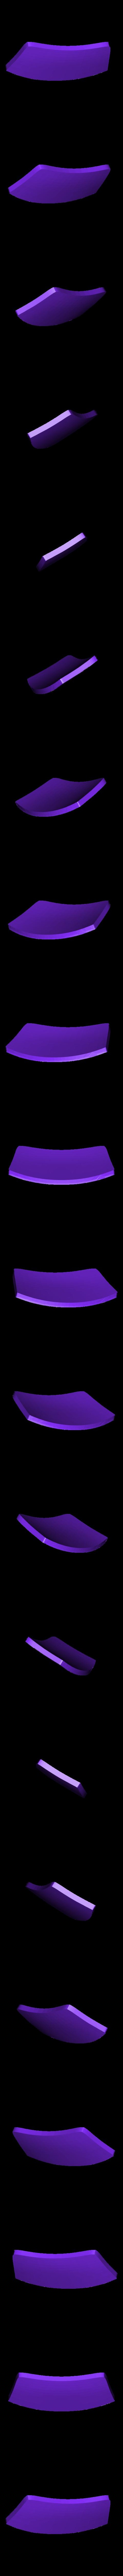 windscreen resized.stl Download free STL file MUSTANG 2016 • 3D printer object, EASY3DSTORE